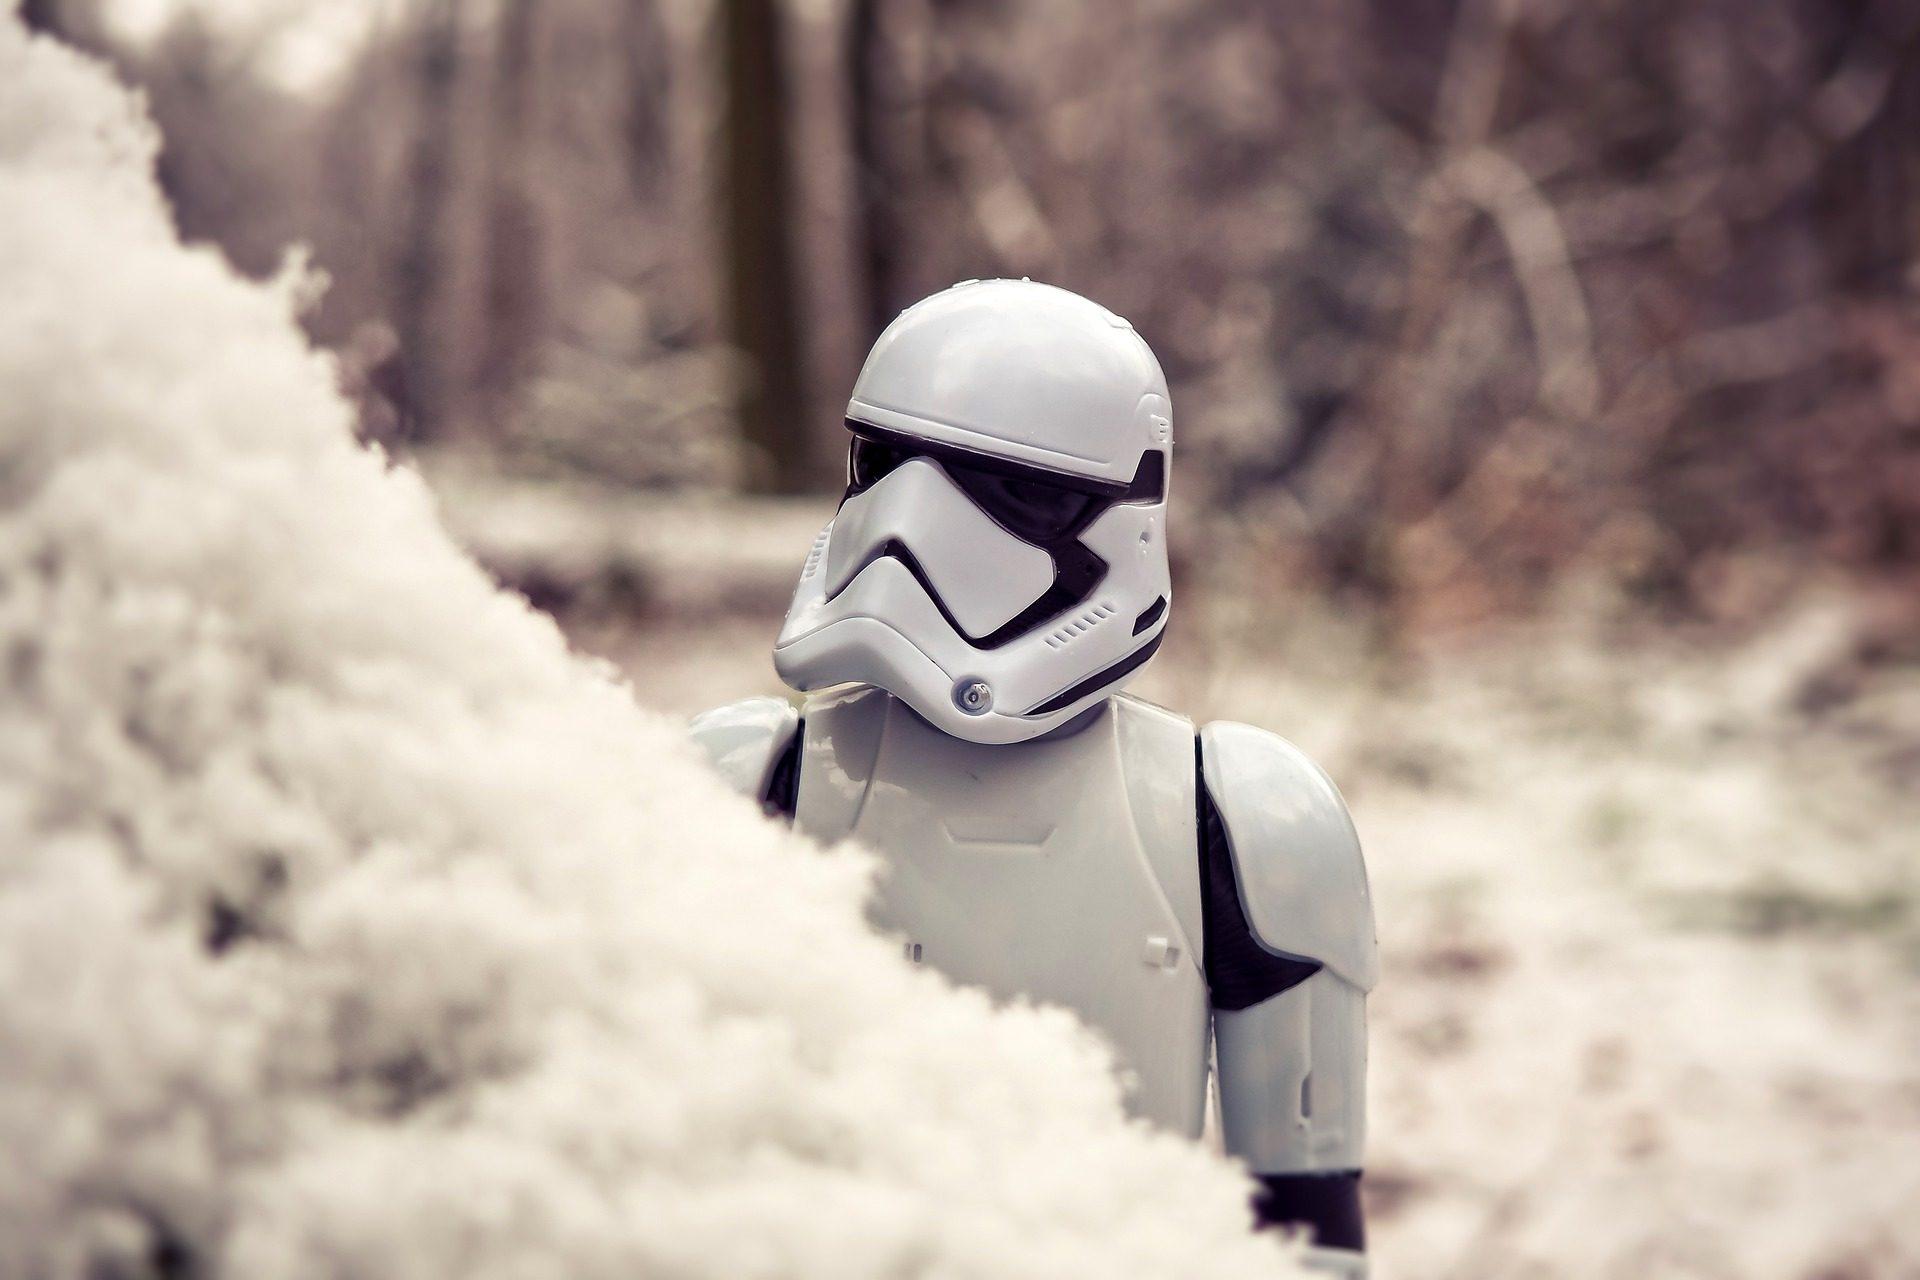 soldado, Imperial, Star wars, Brinquedo, Figura, neve - Papéis de parede HD - Professor-falken.com